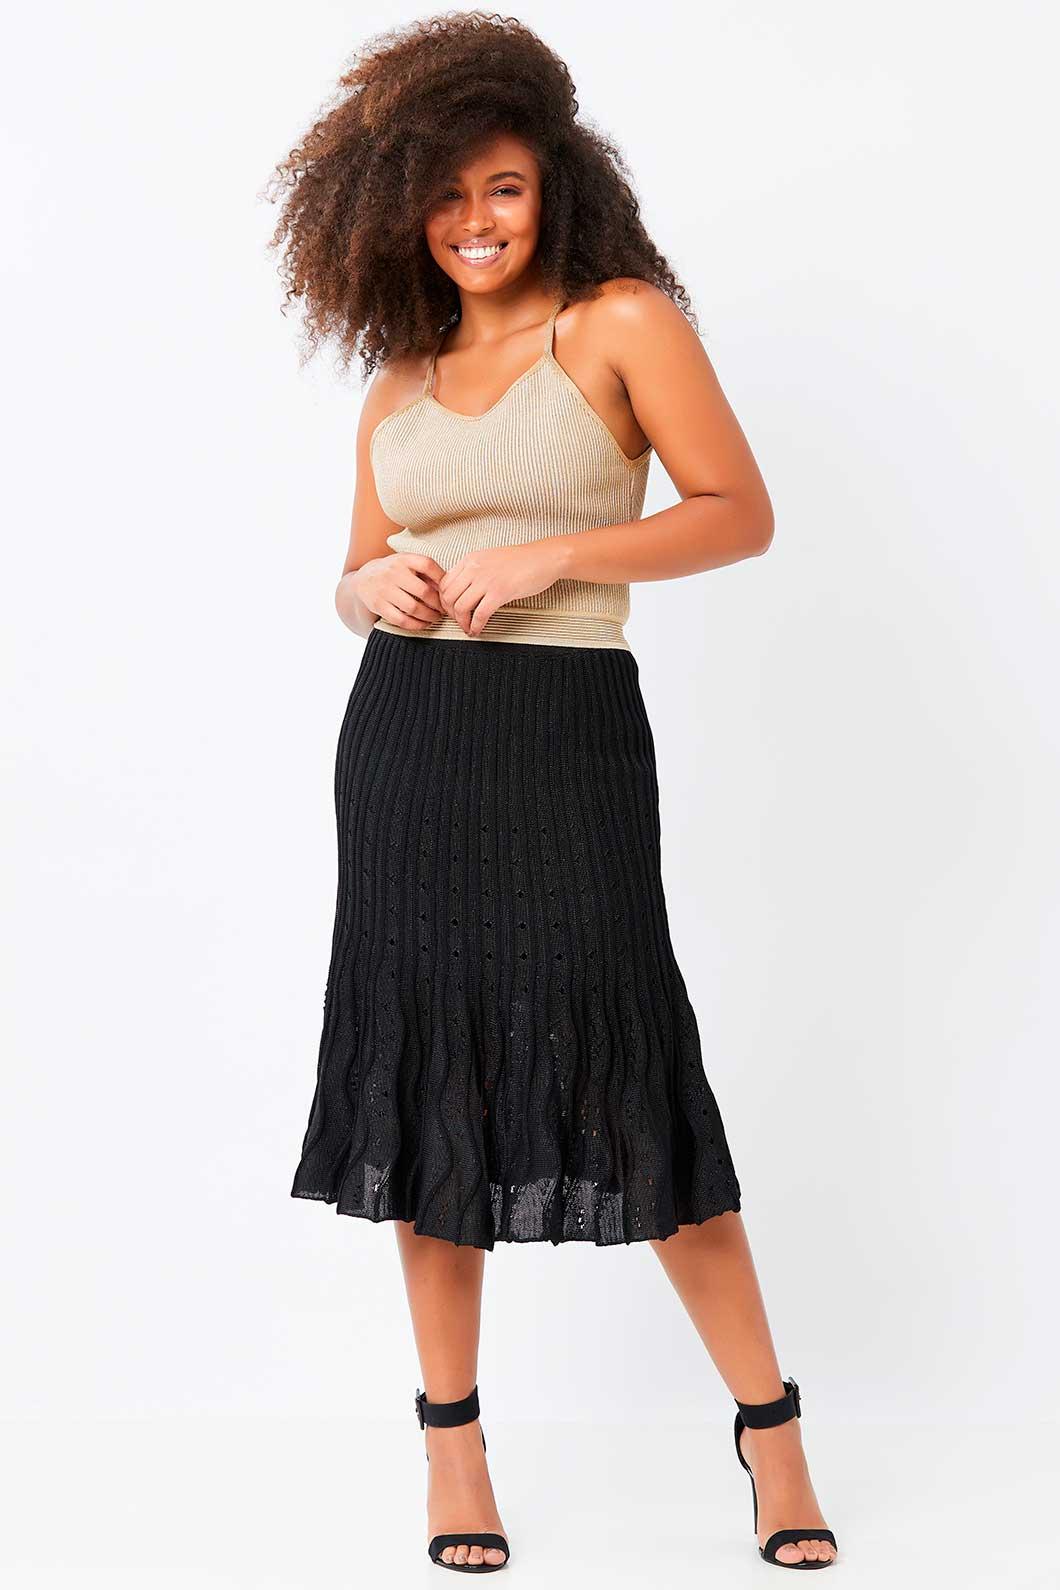 Blusa Ralm cropped alças de tricot